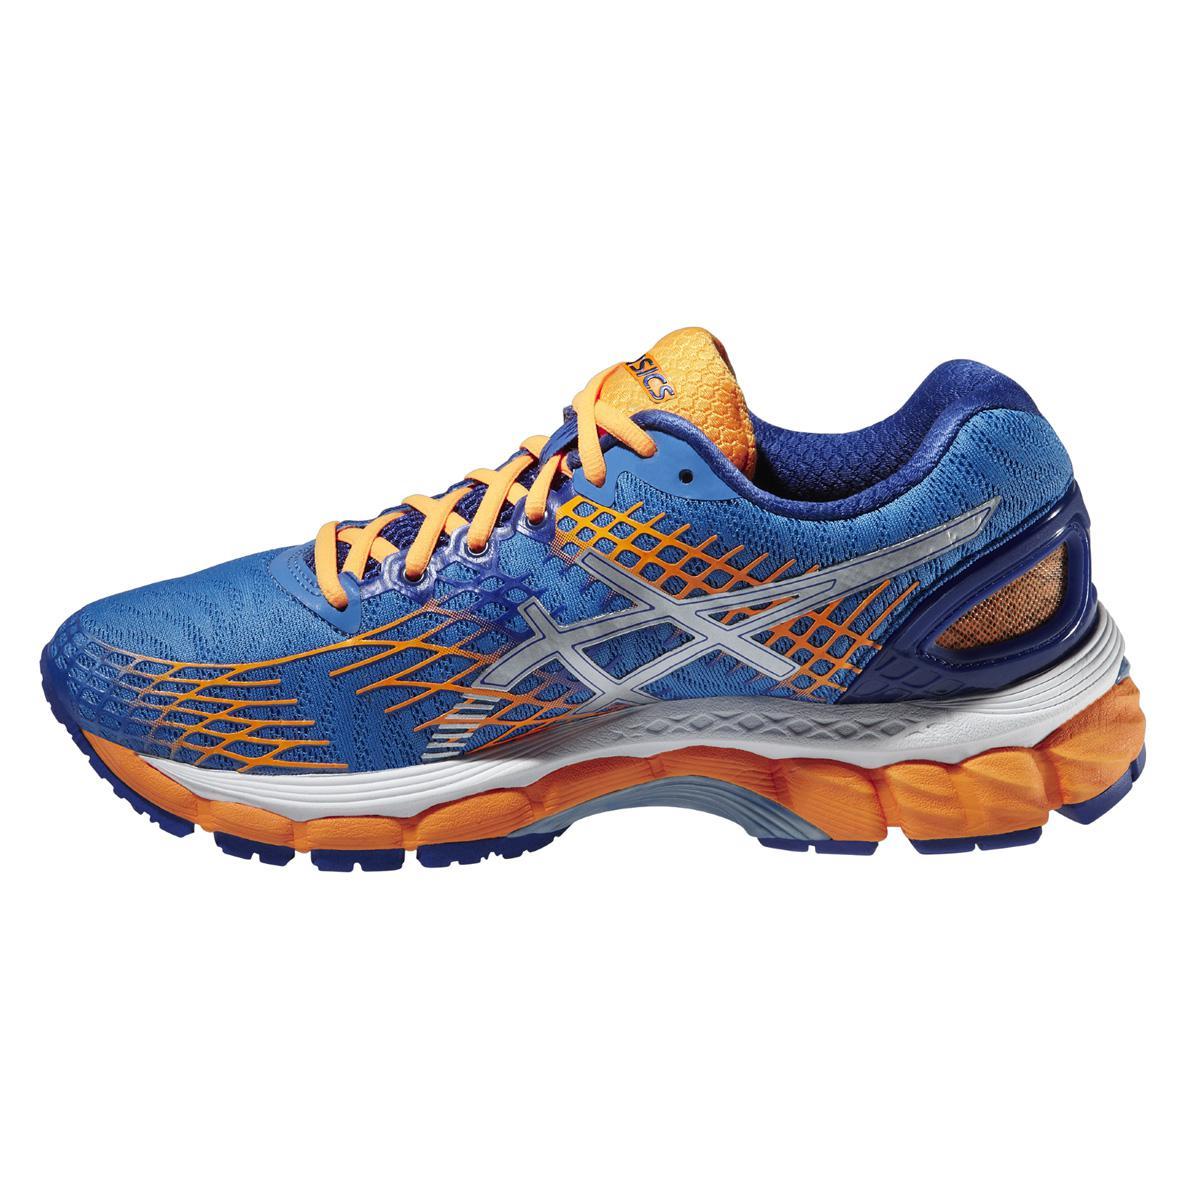 asics womens gel nimbus 17 running shoes powder blue. Black Bedroom Furniture Sets. Home Design Ideas